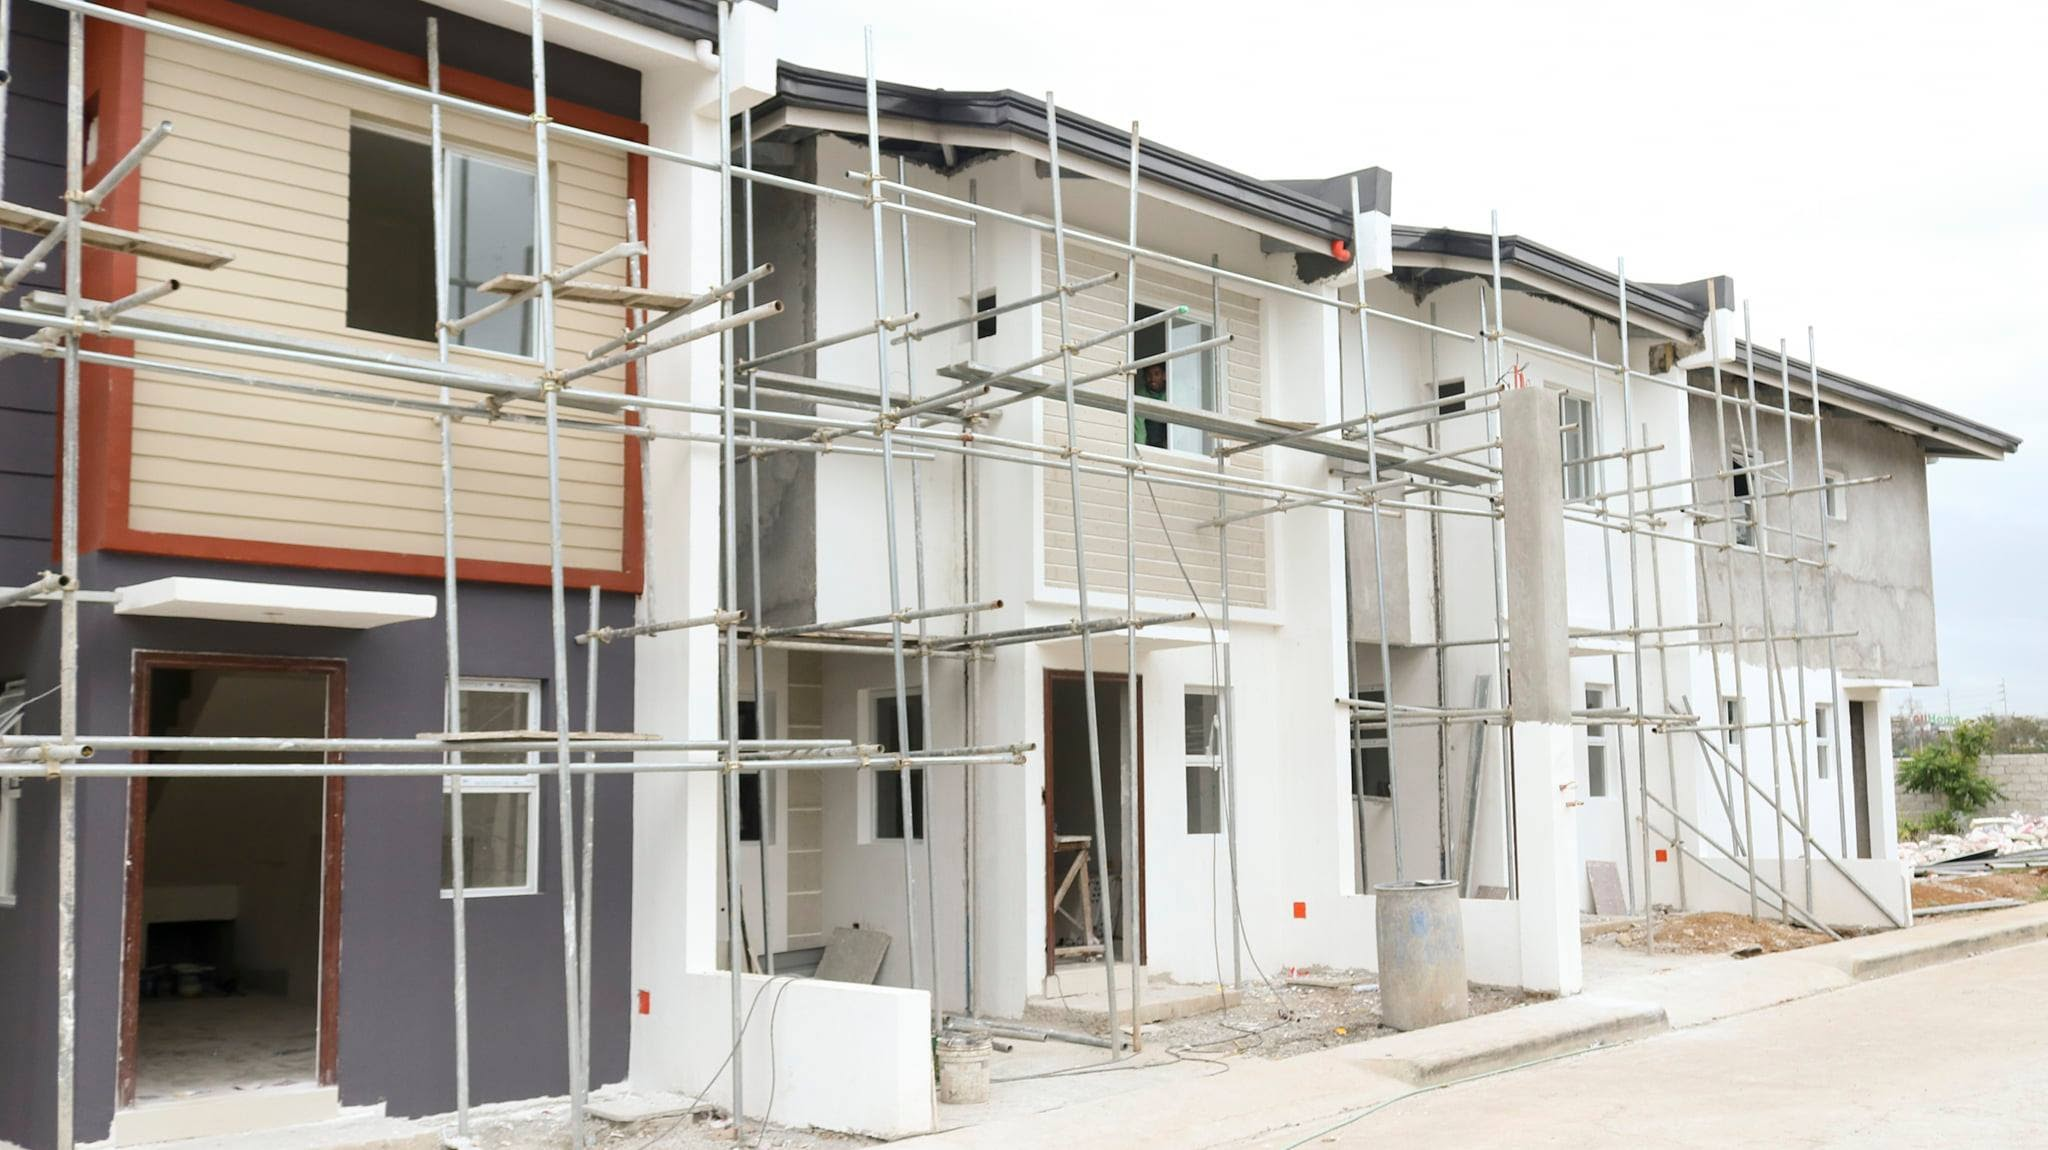 Eminenza Residences 3, San Jose del Monte, Bulacan April 2021 construction update